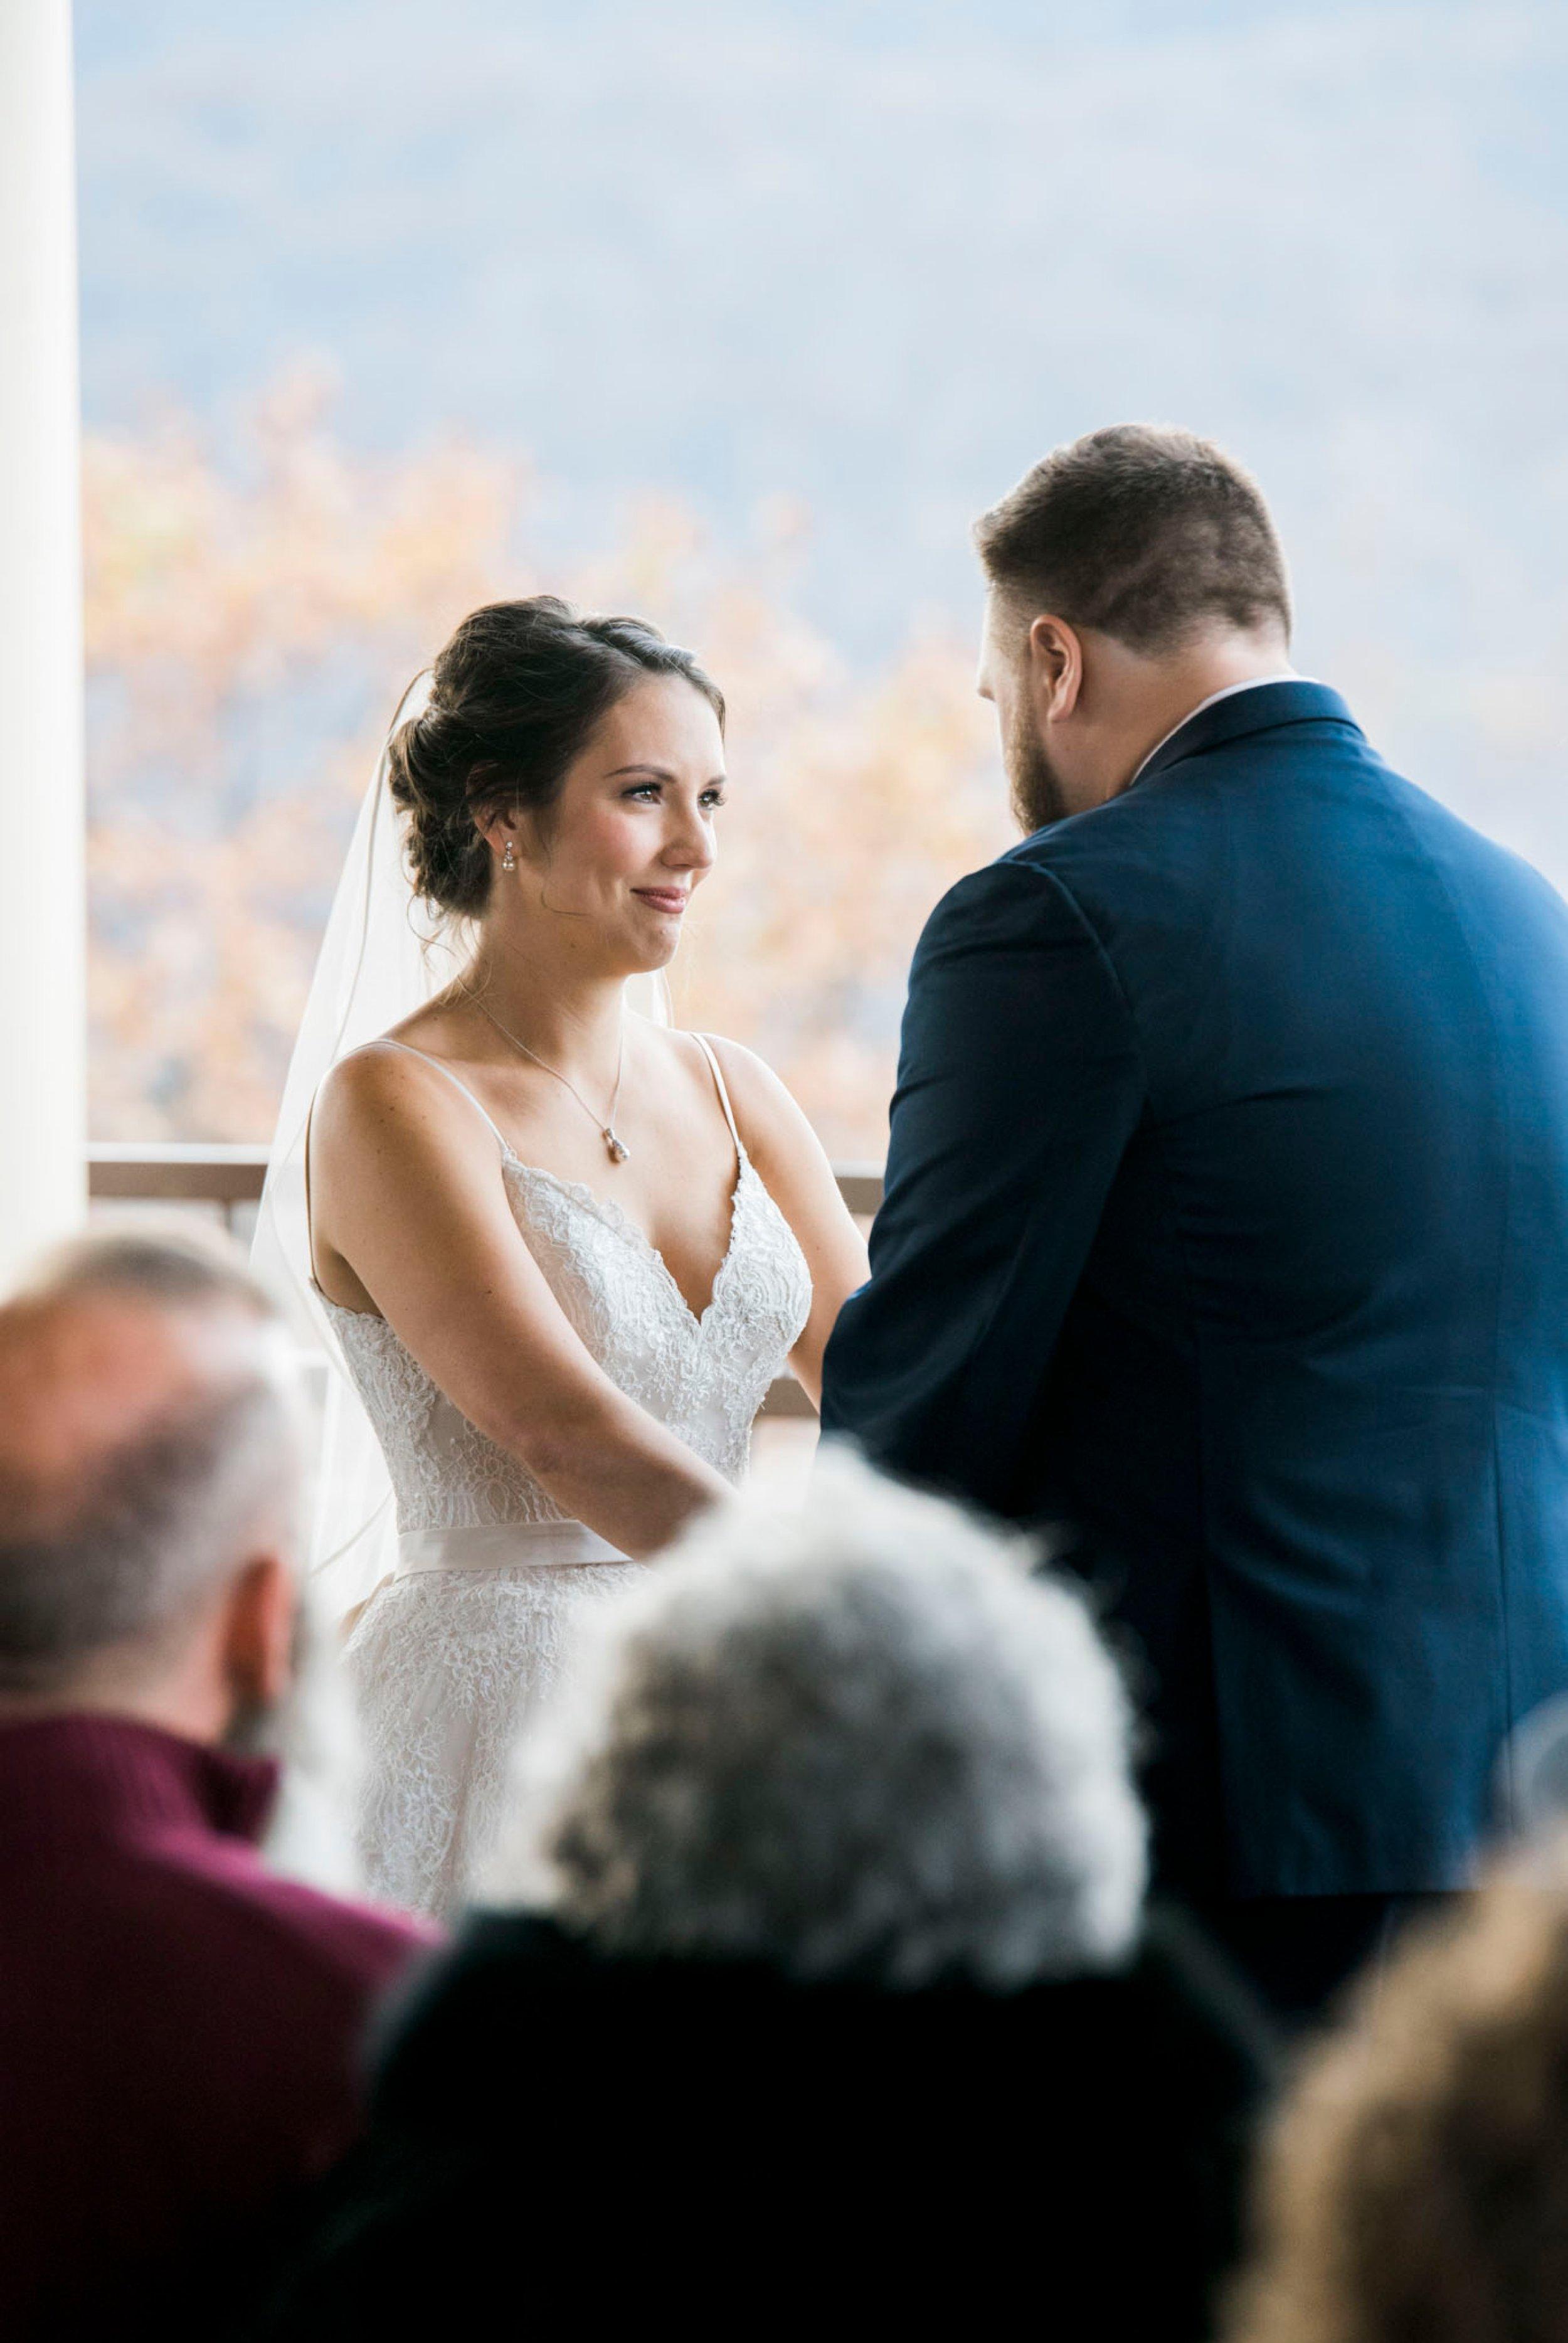 IrvineEstate_LexingtonVA_Wedding_FallWedding_VirginiaWeddingPhotographer 61.jpg